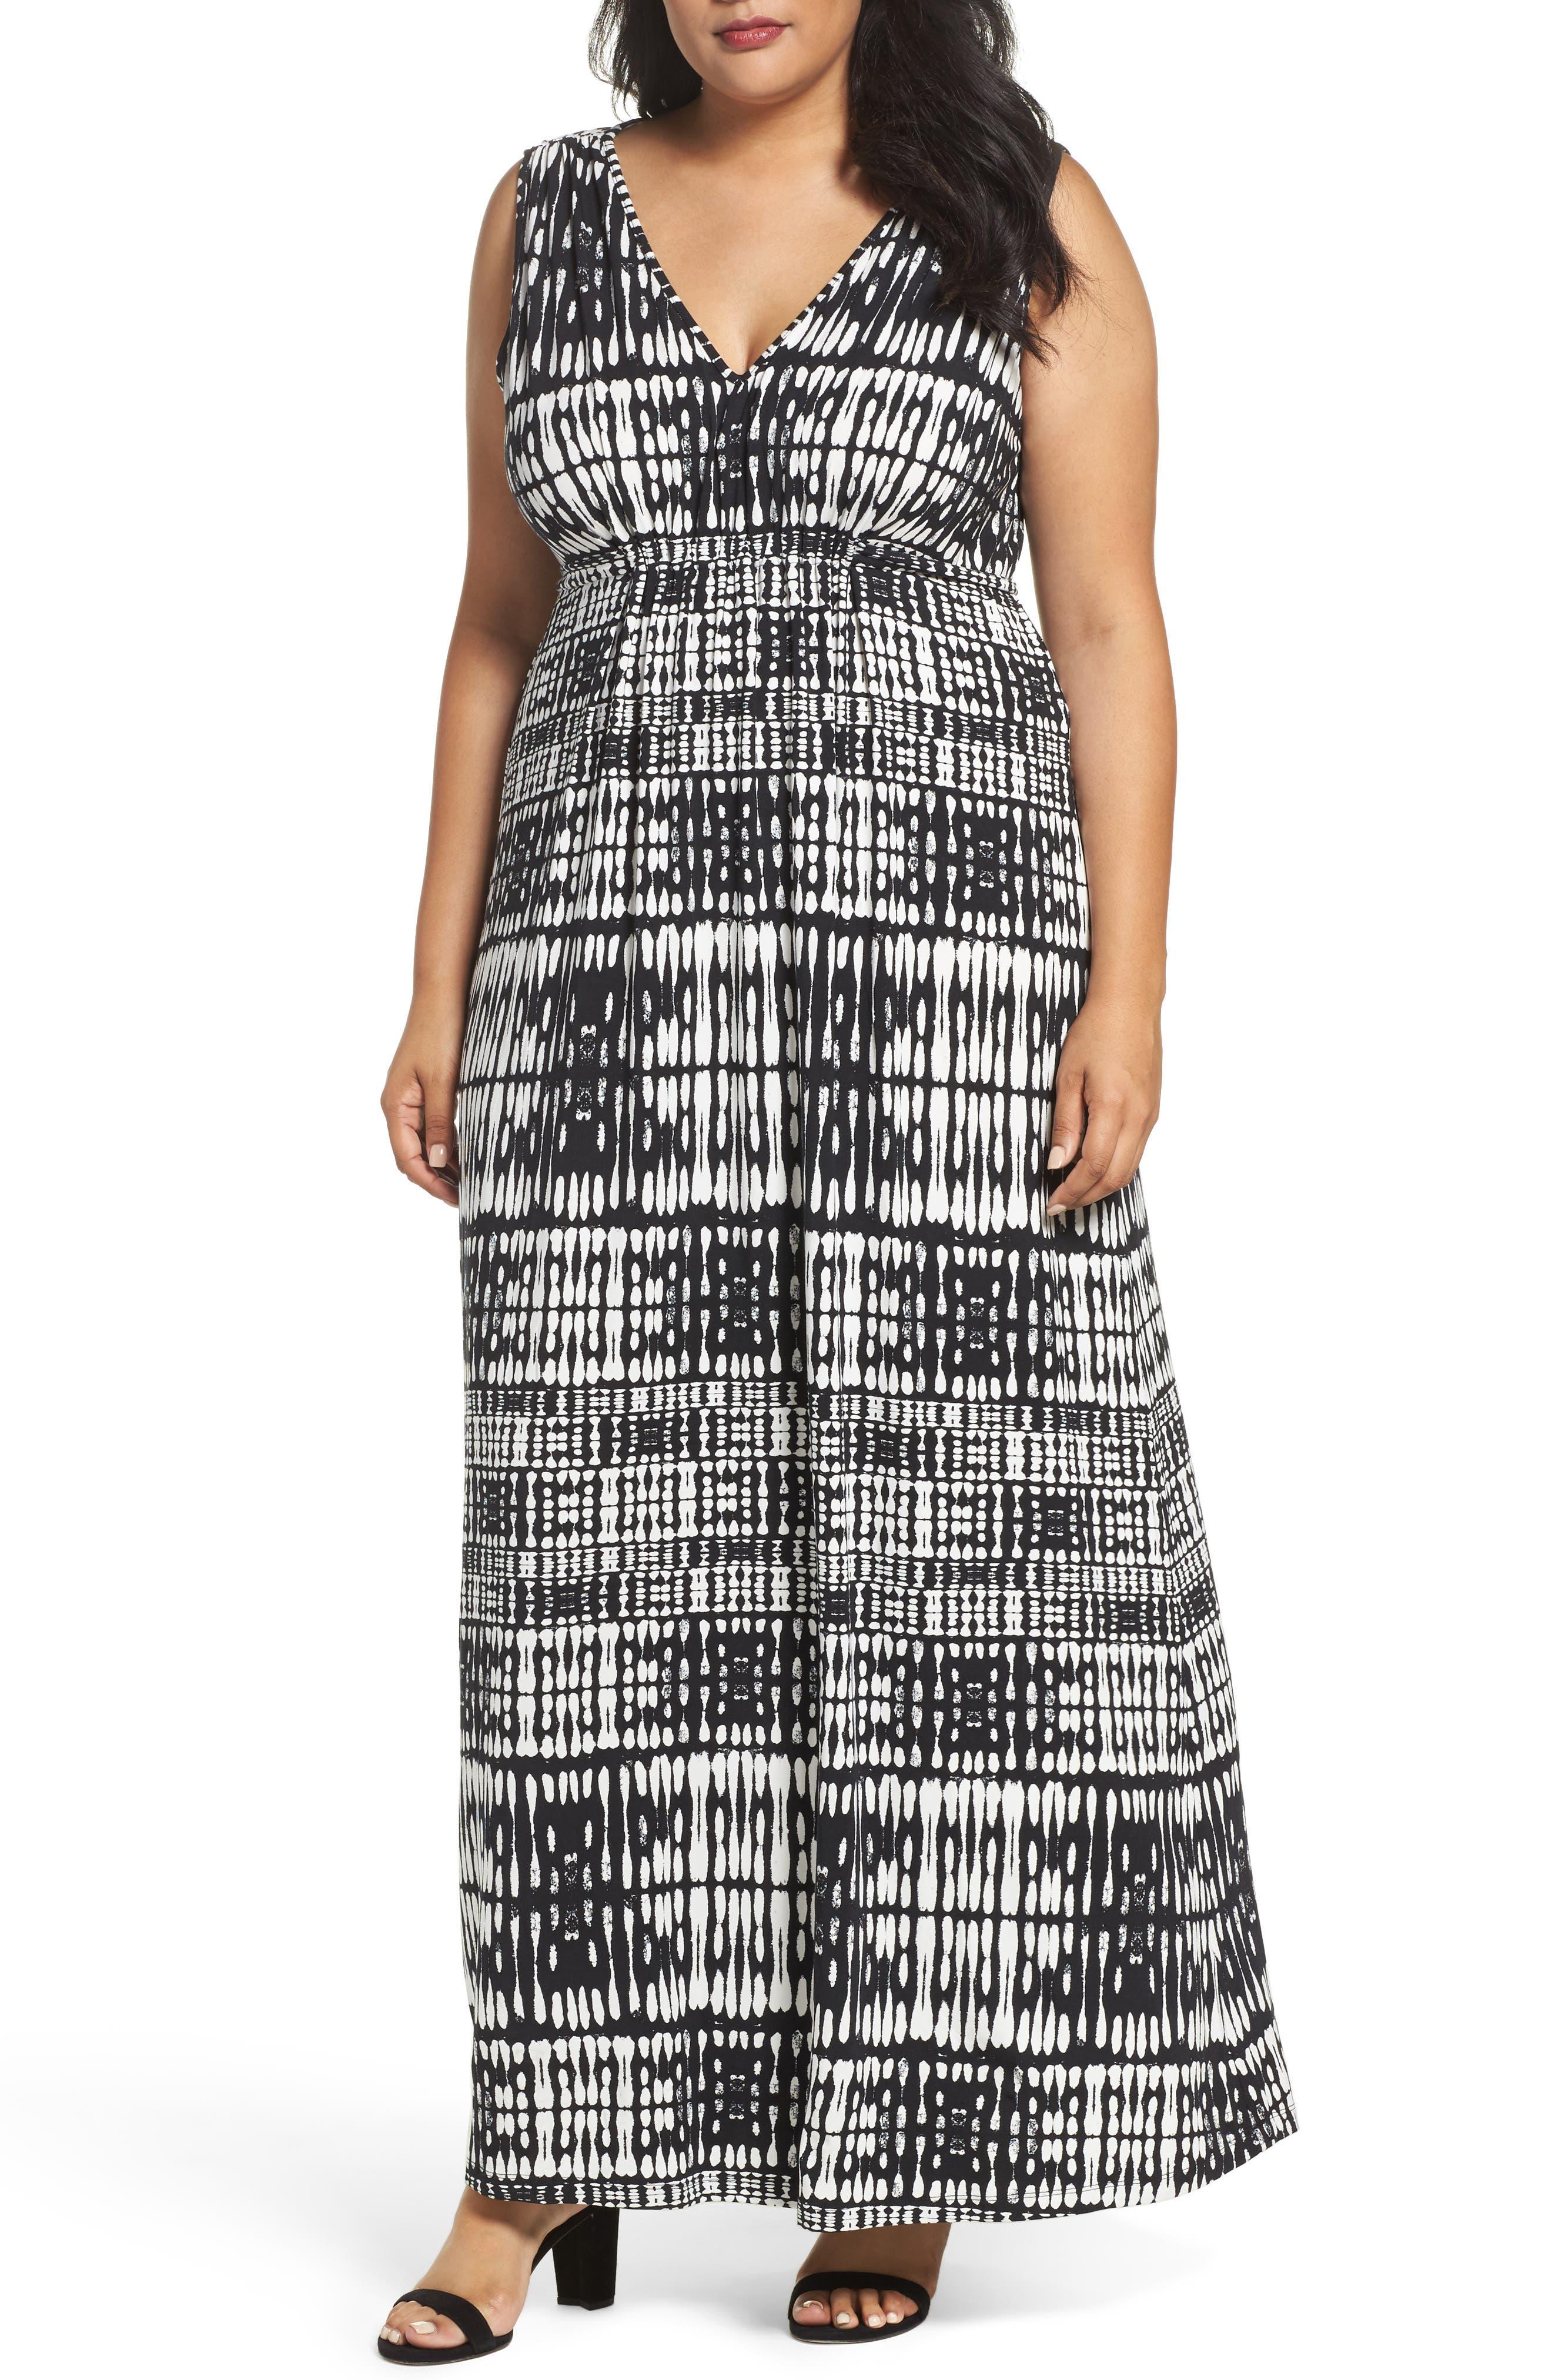 Alternate Image 1 Selected - Tart Grecia Sleeveless Jersey Maxi Dress (Plus Size)